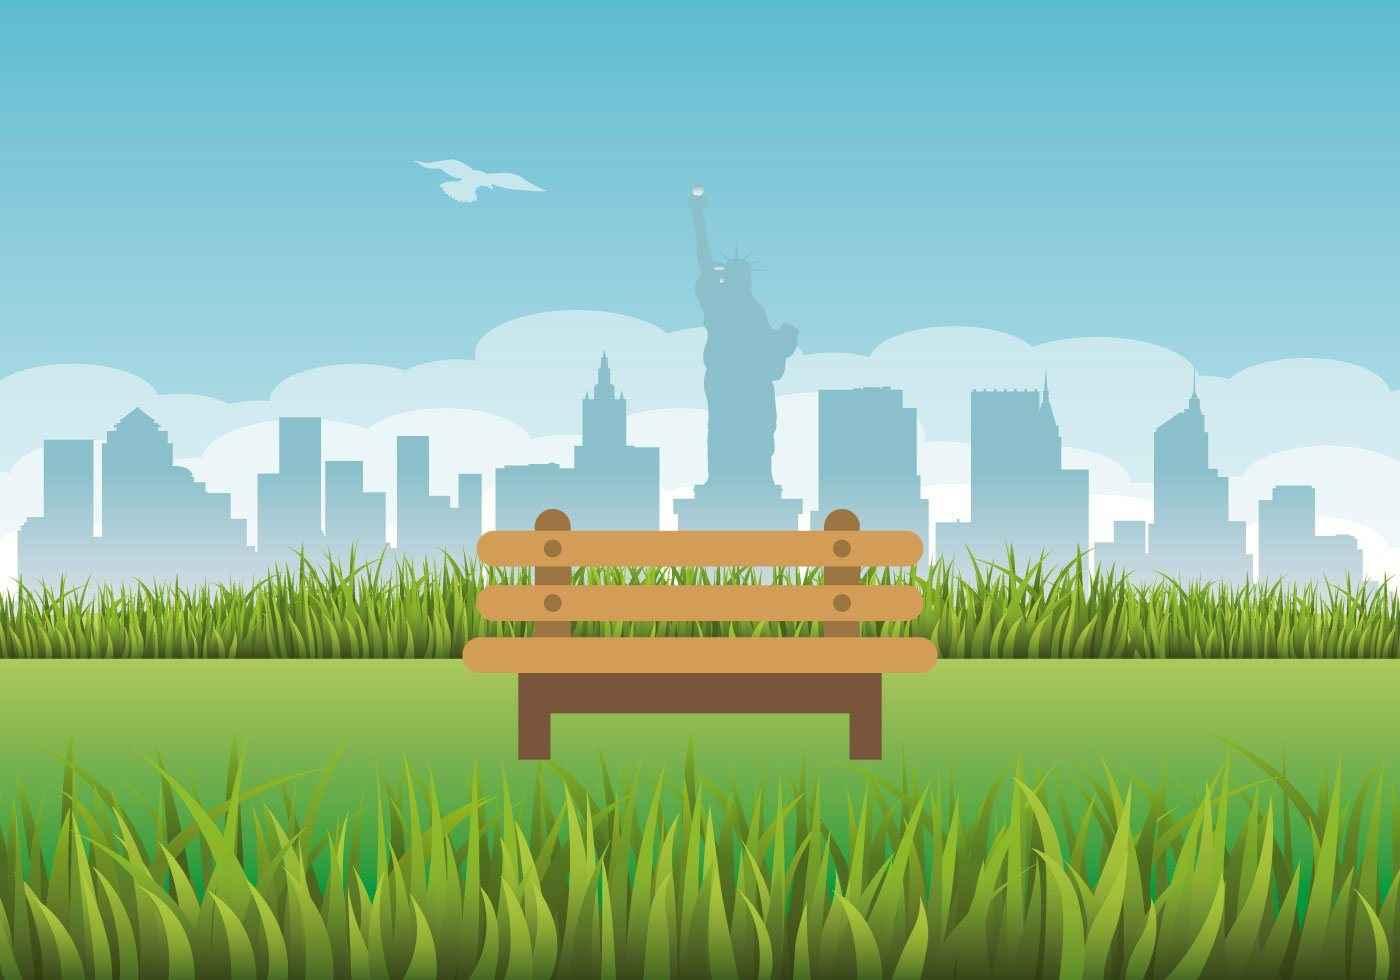 New York Illustration Vector